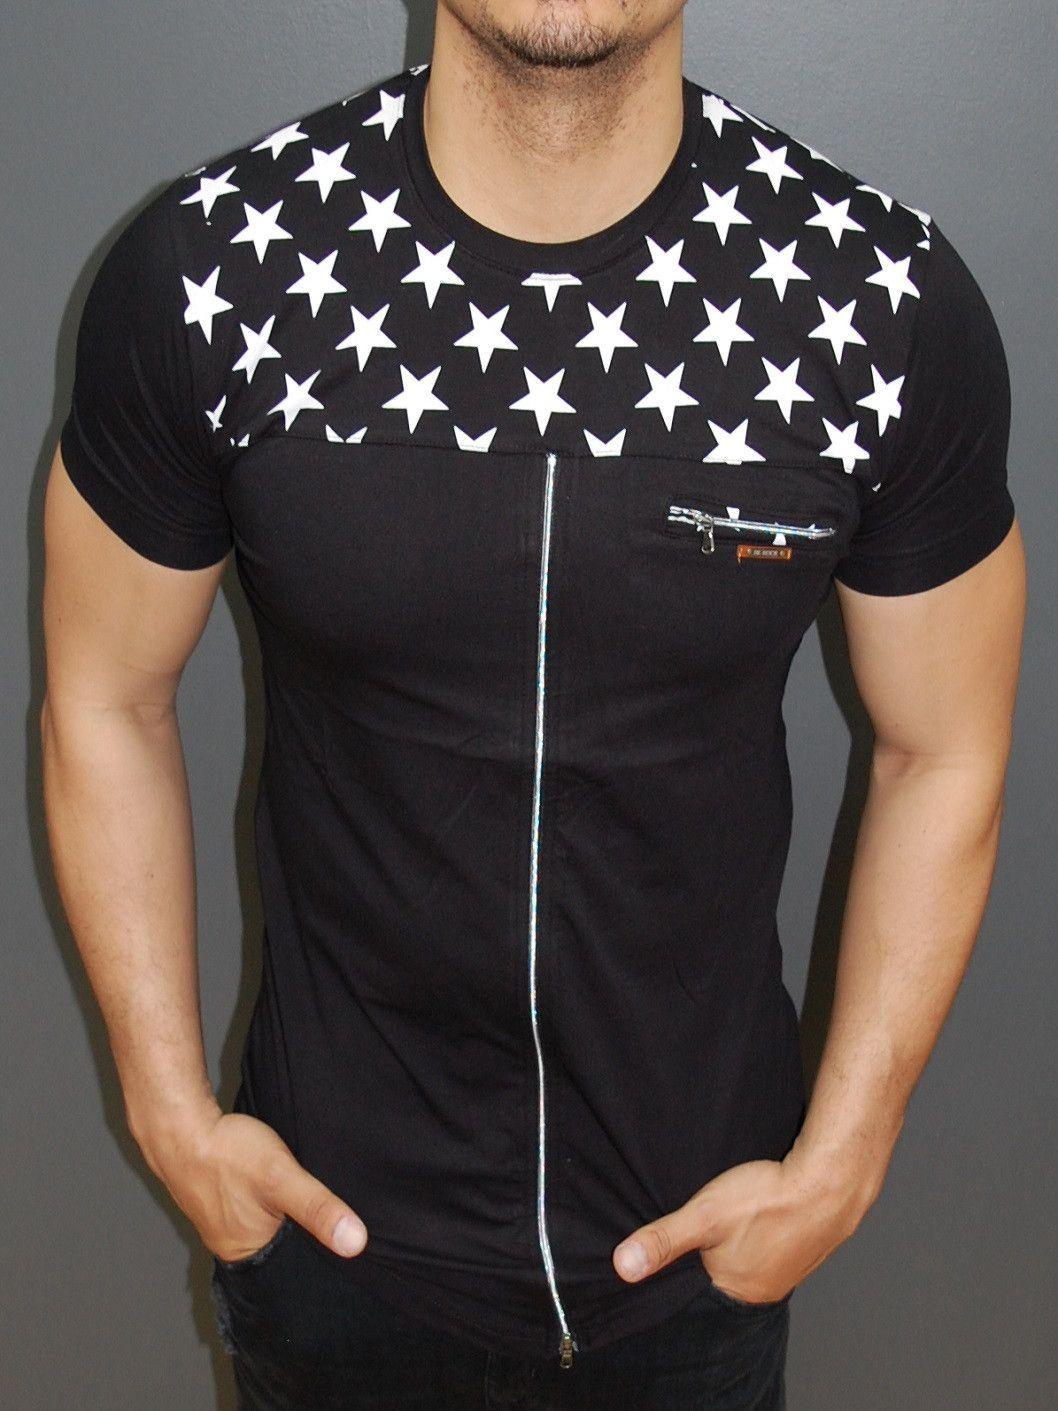 Rr Men Stars Top Front Back Zipper T Shirt Black Summer Shoes